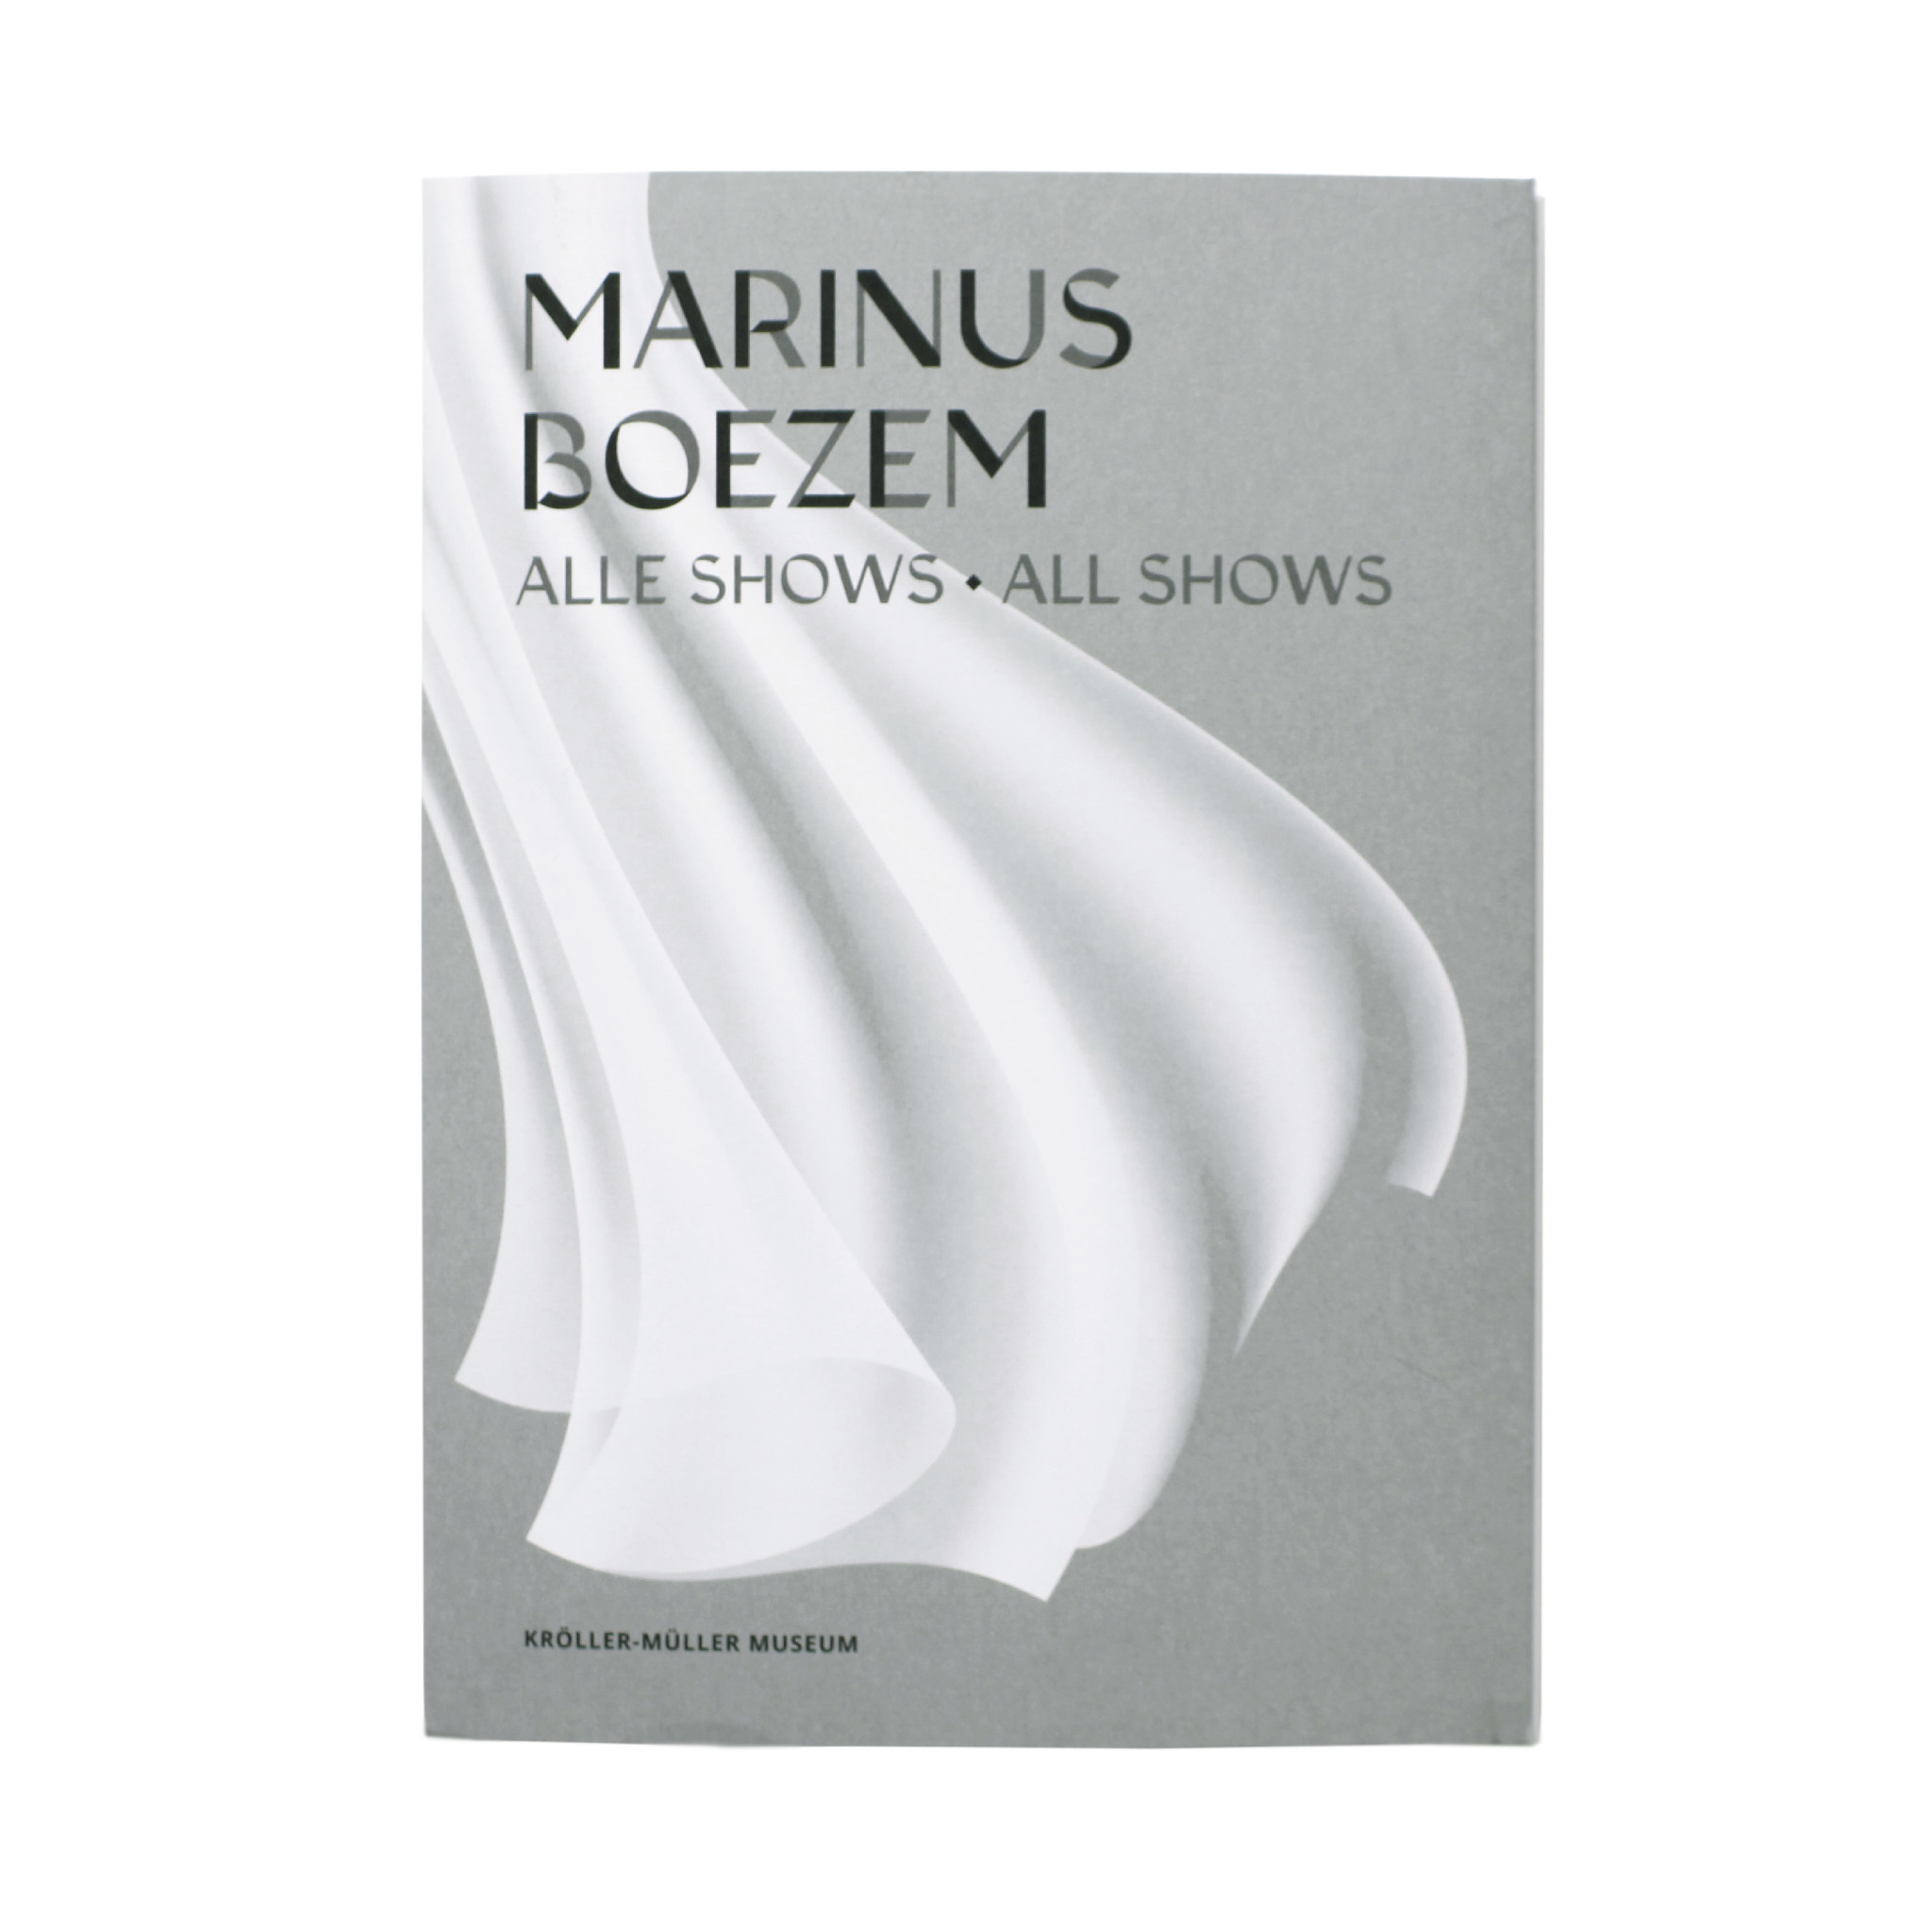 Marinus Boezem. Alle shows